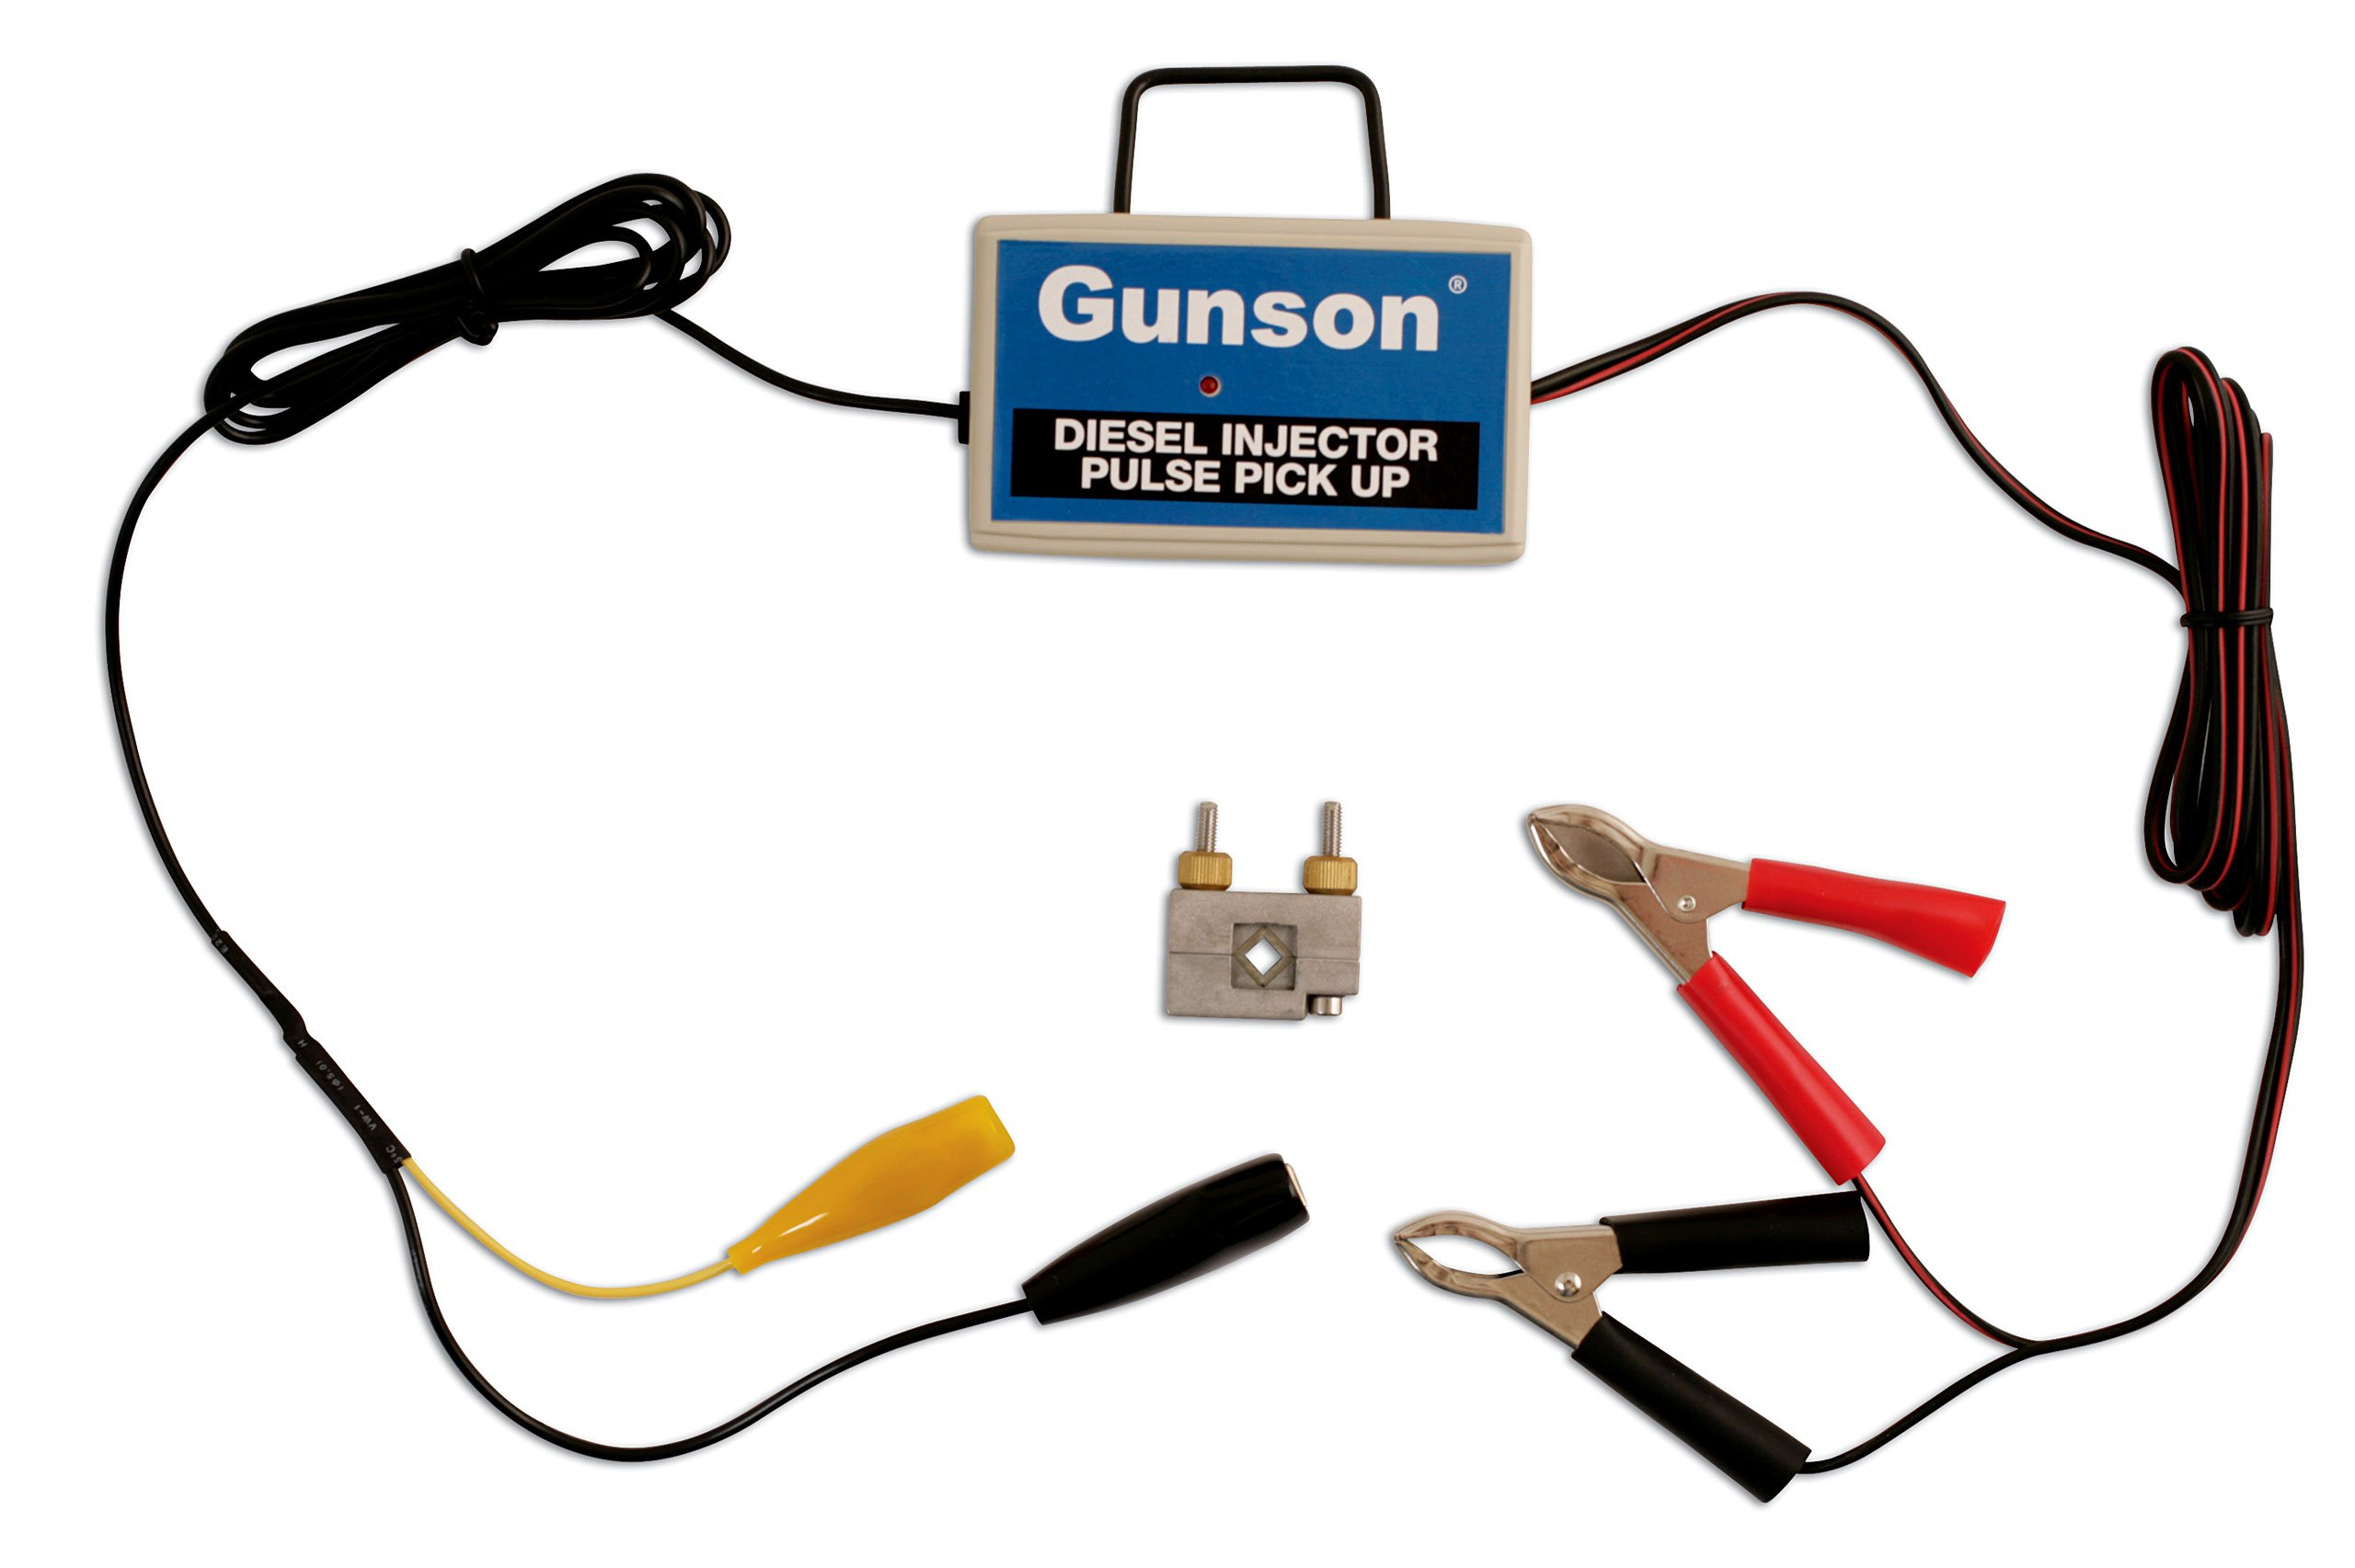 Gunson - 77089 Diesel Adaptor For Timing Lights by Gunson (Image #3)